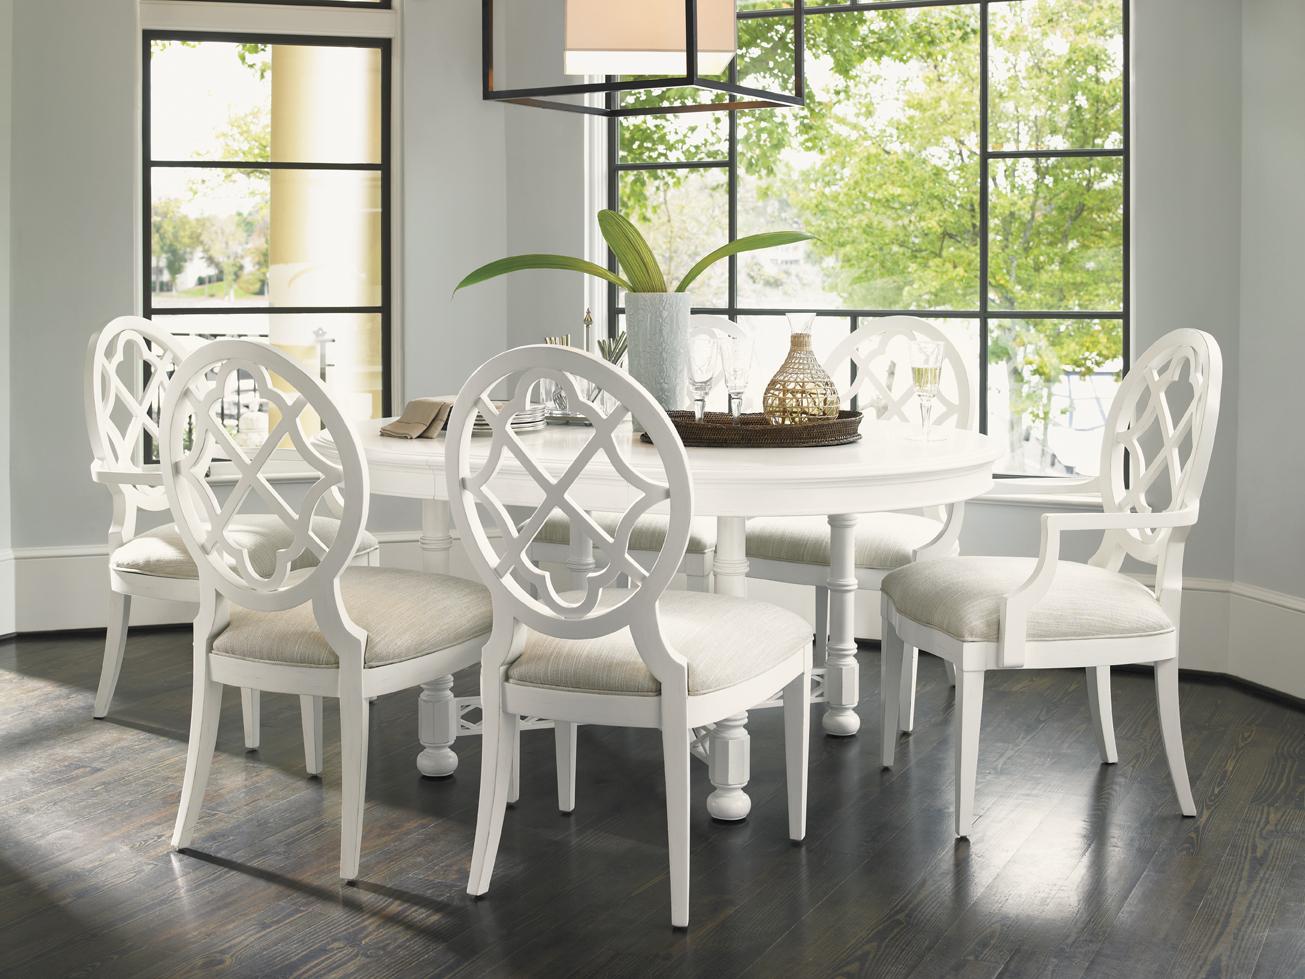 Dining Room McQueens Interiors. Discontinued Lexington Dining Room Furniture  ...